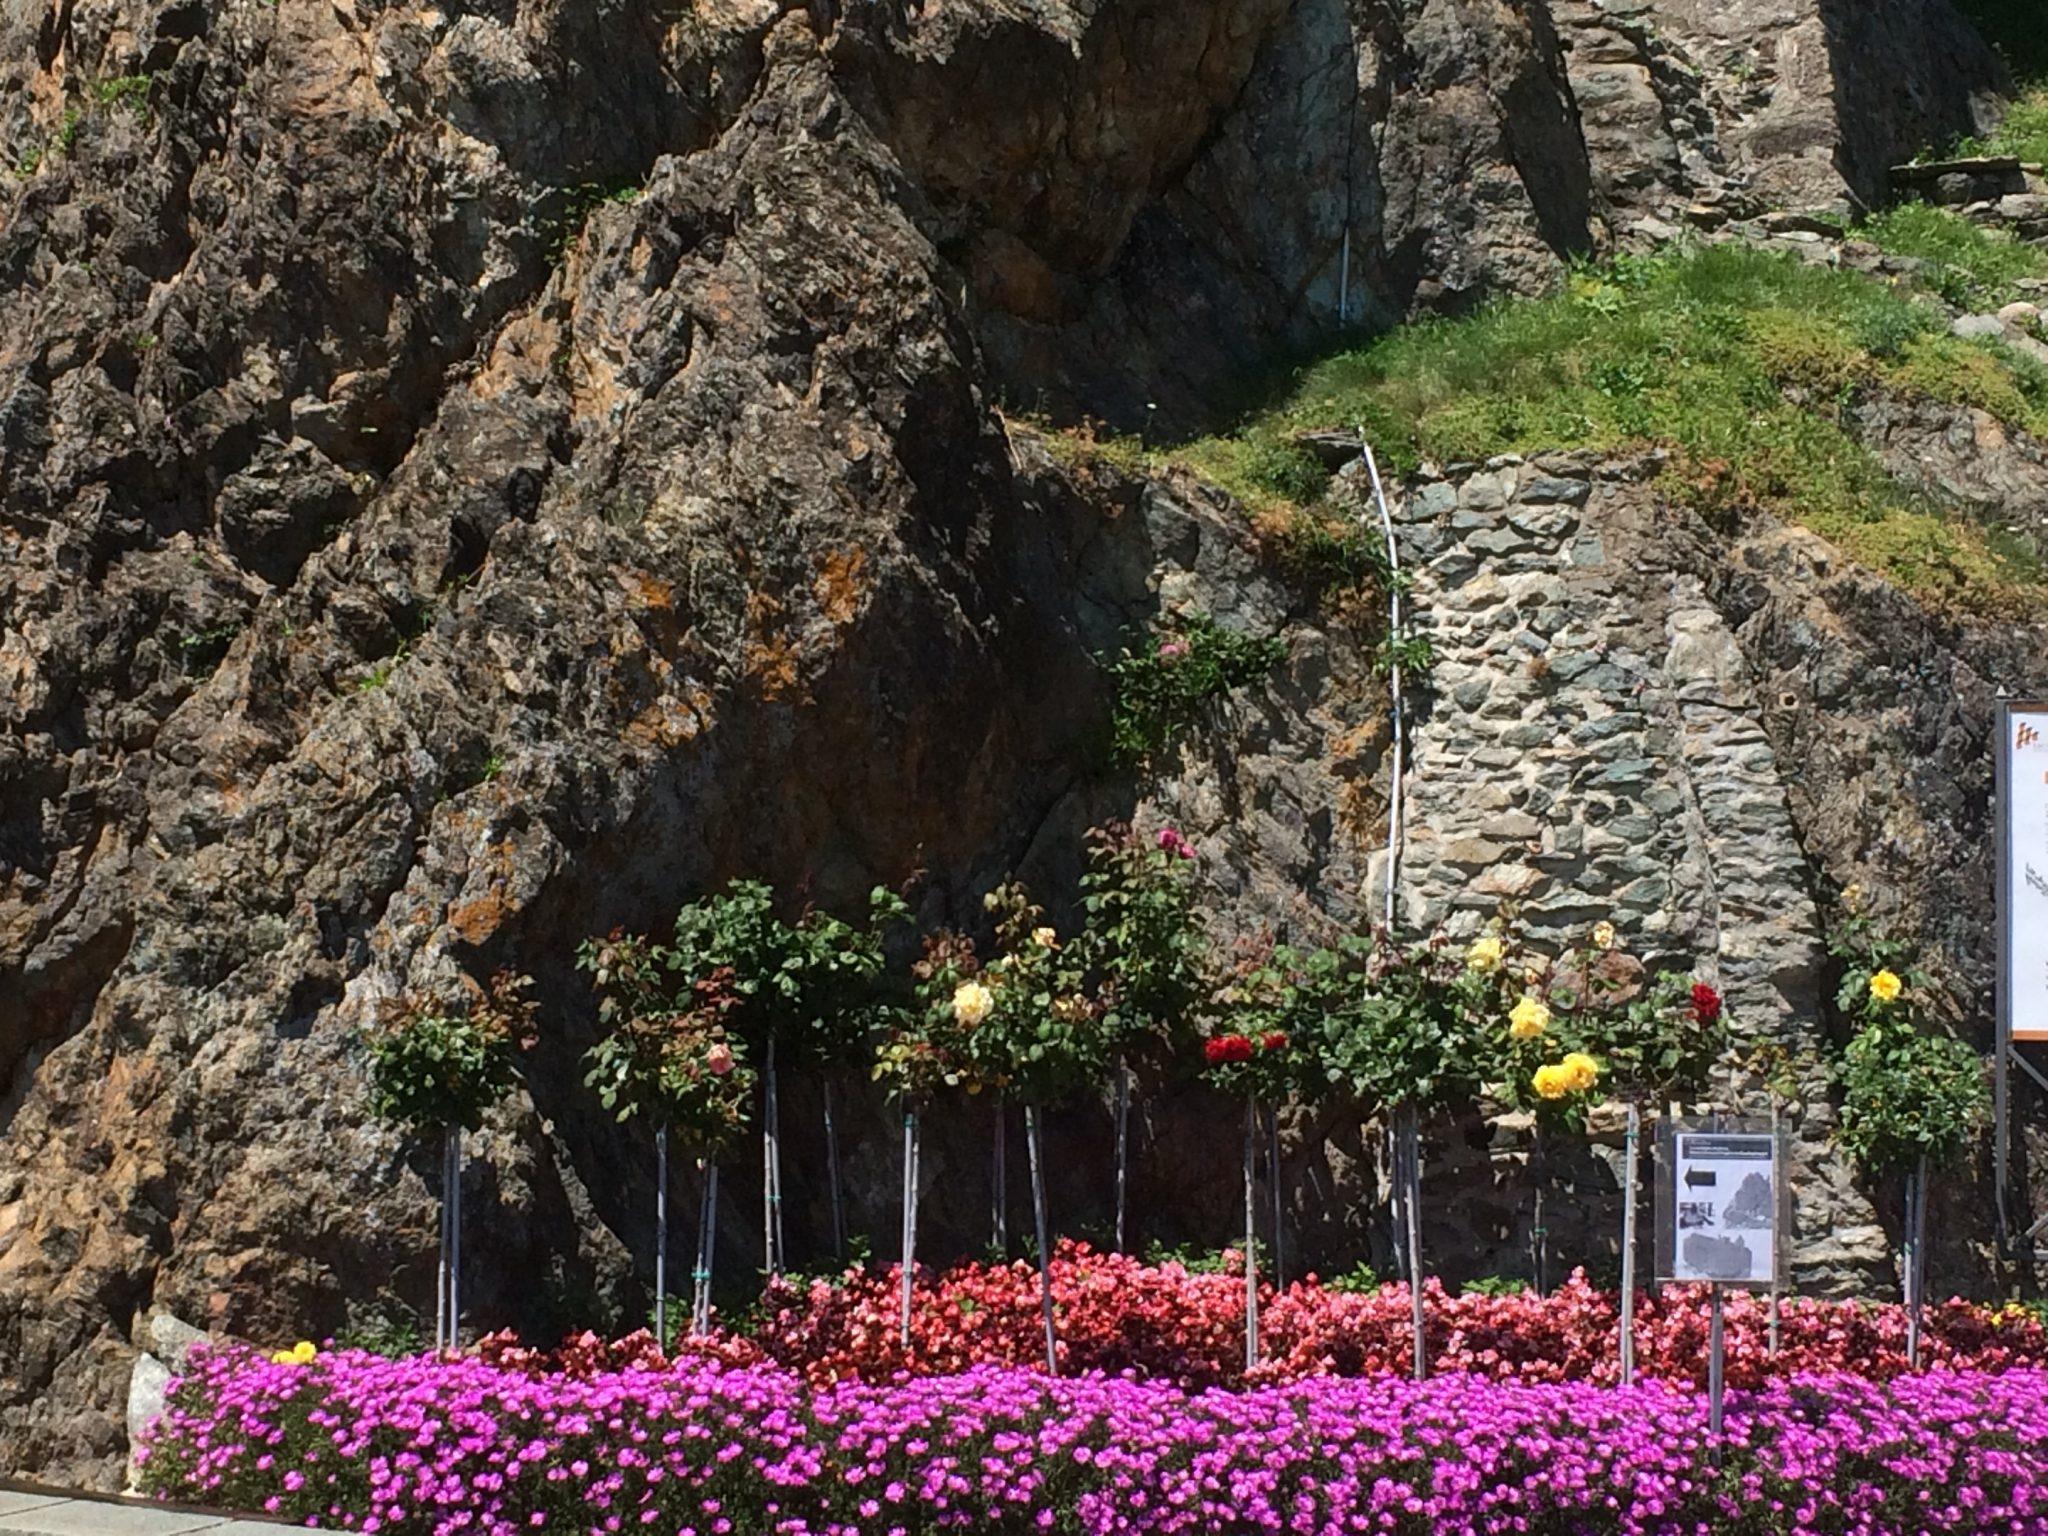 img 4233 - Sacra di San Michele: a monastery on the rocks